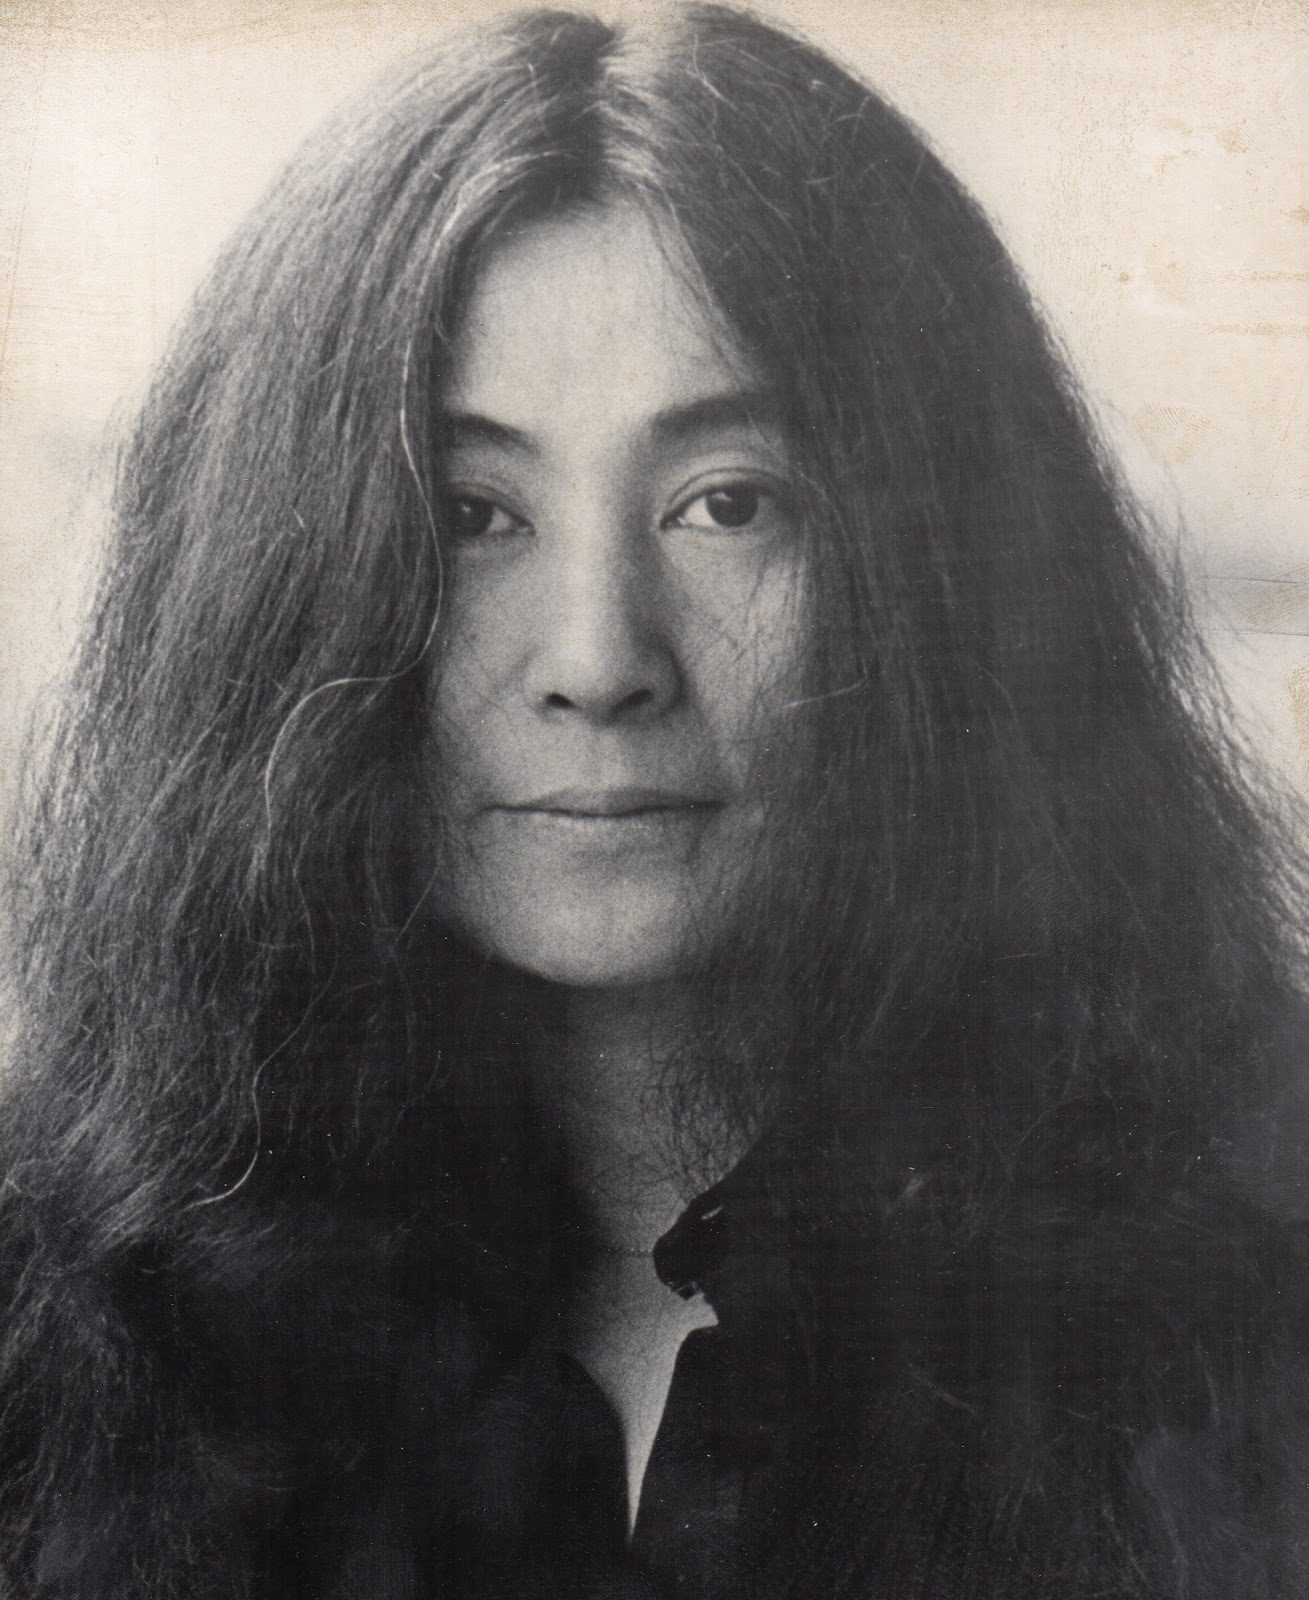 John Lennon And Yoko Ono Two Virgins